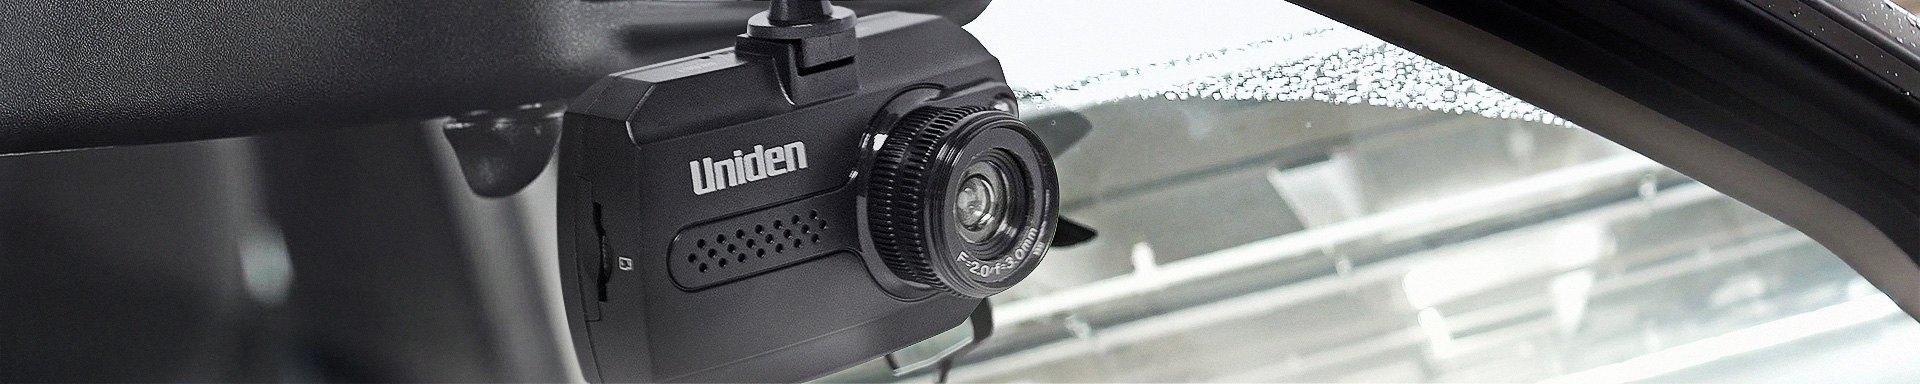 Uniden™ | Cordless Phones, Scanners, Walkie Talkies